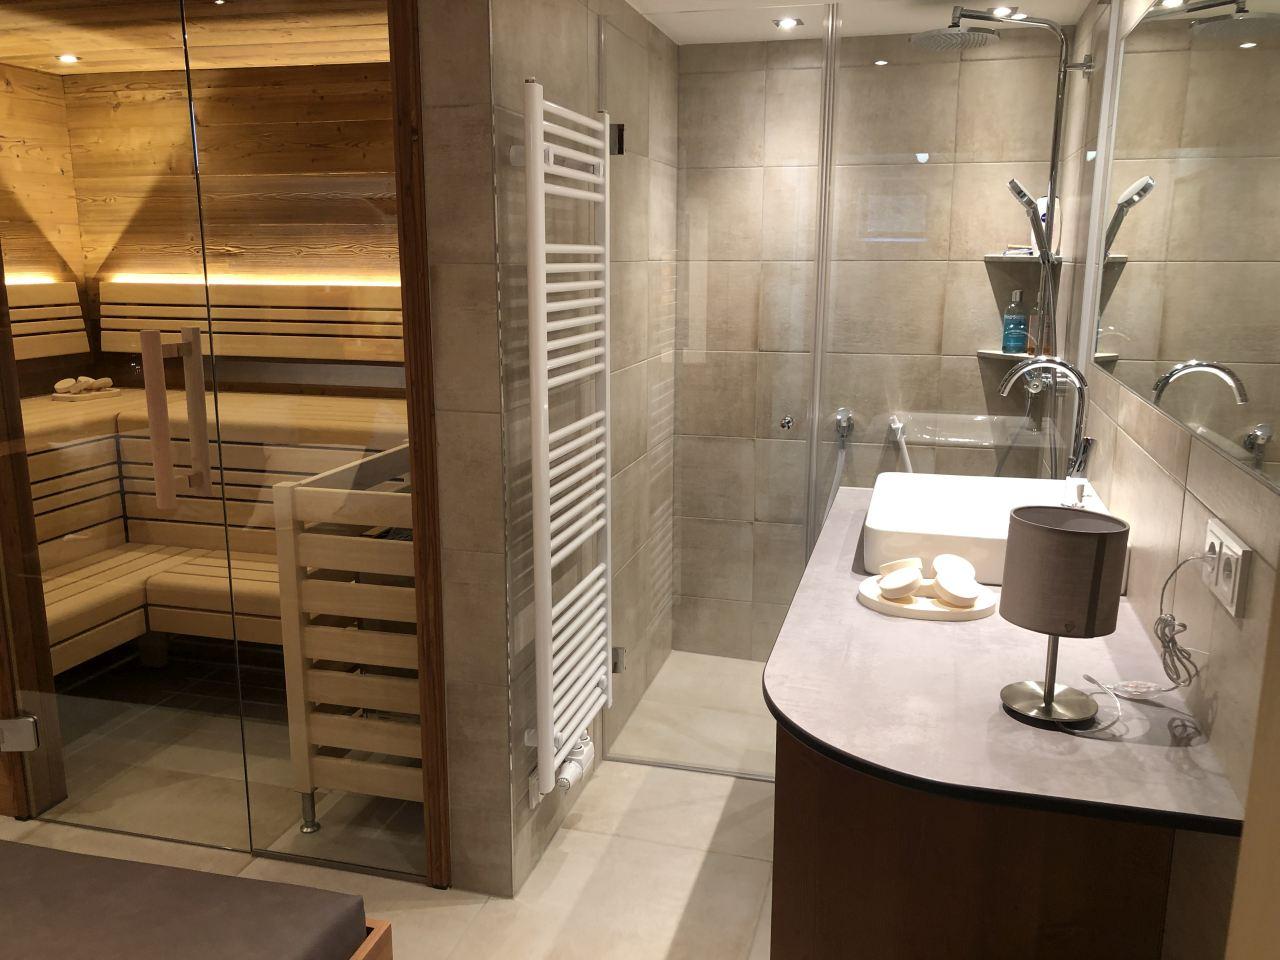 Baustelle Privat – Sauna